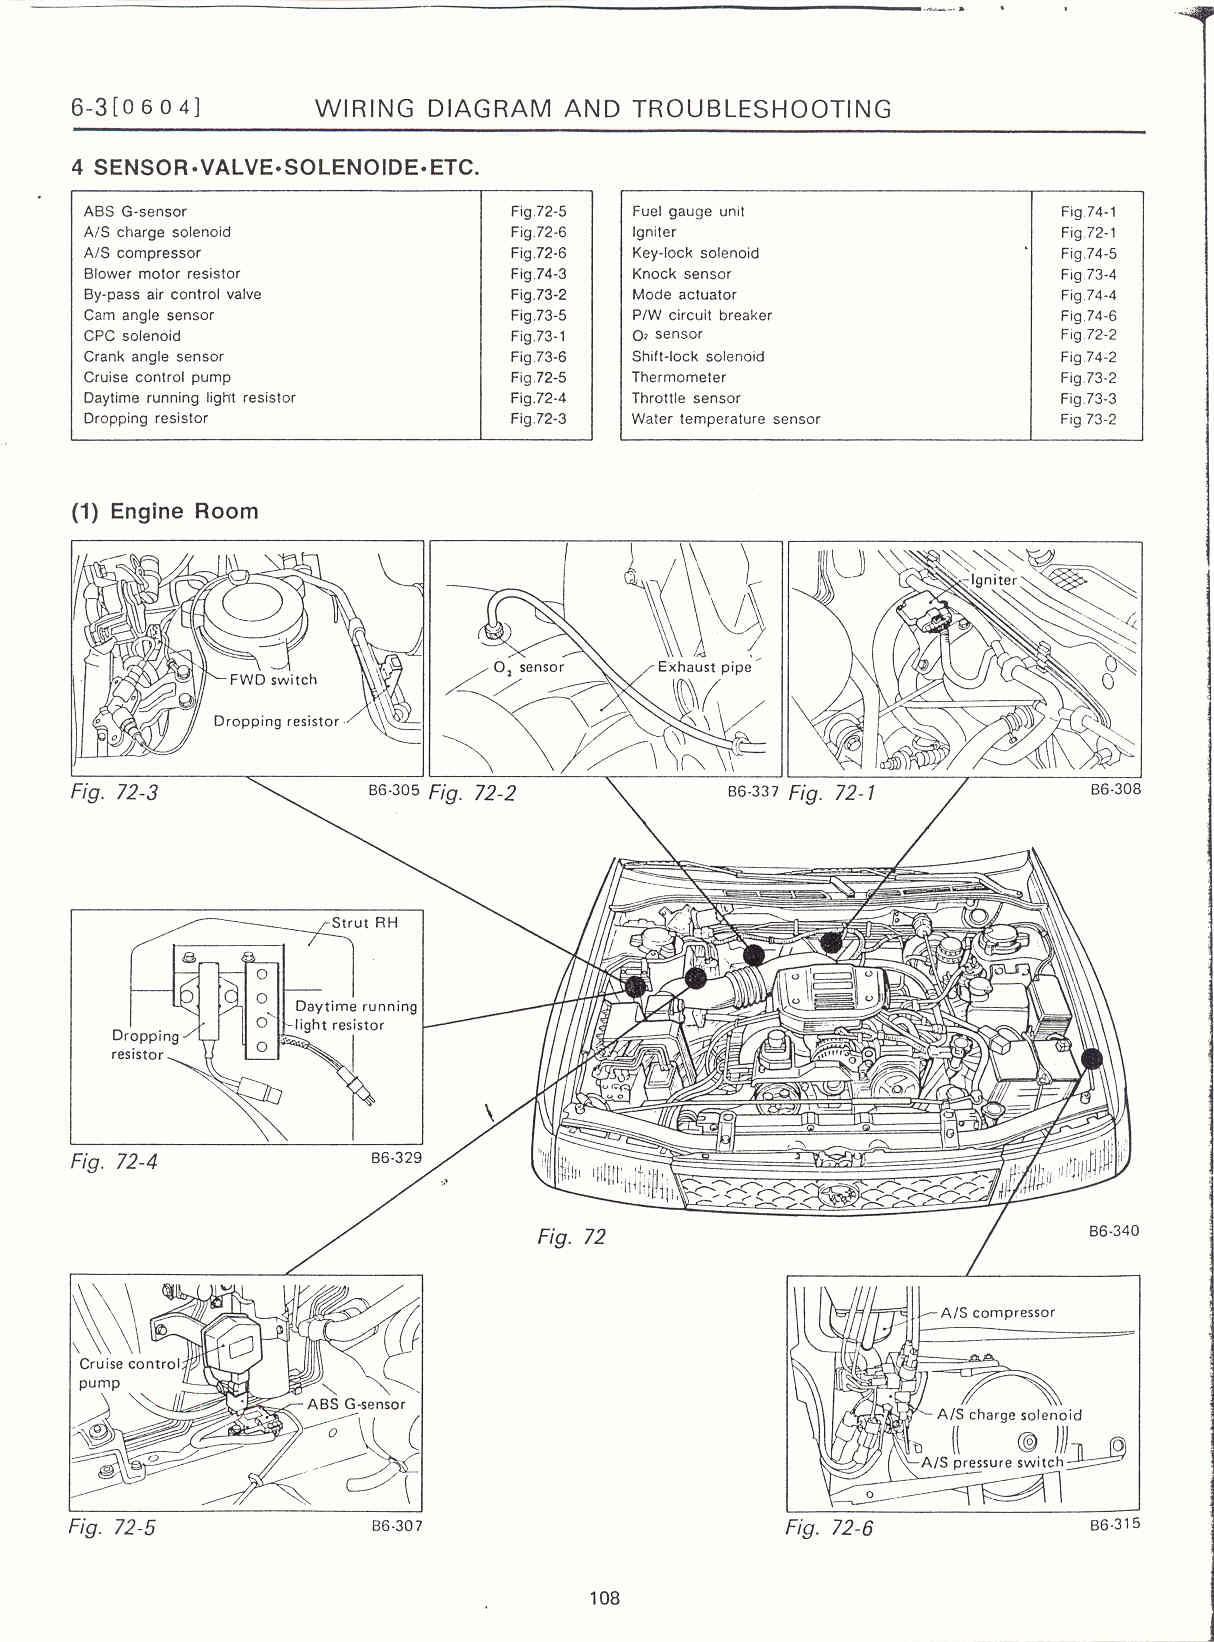 subaru impreza exhaust system diagram electric wiring car 2002 parts  for free